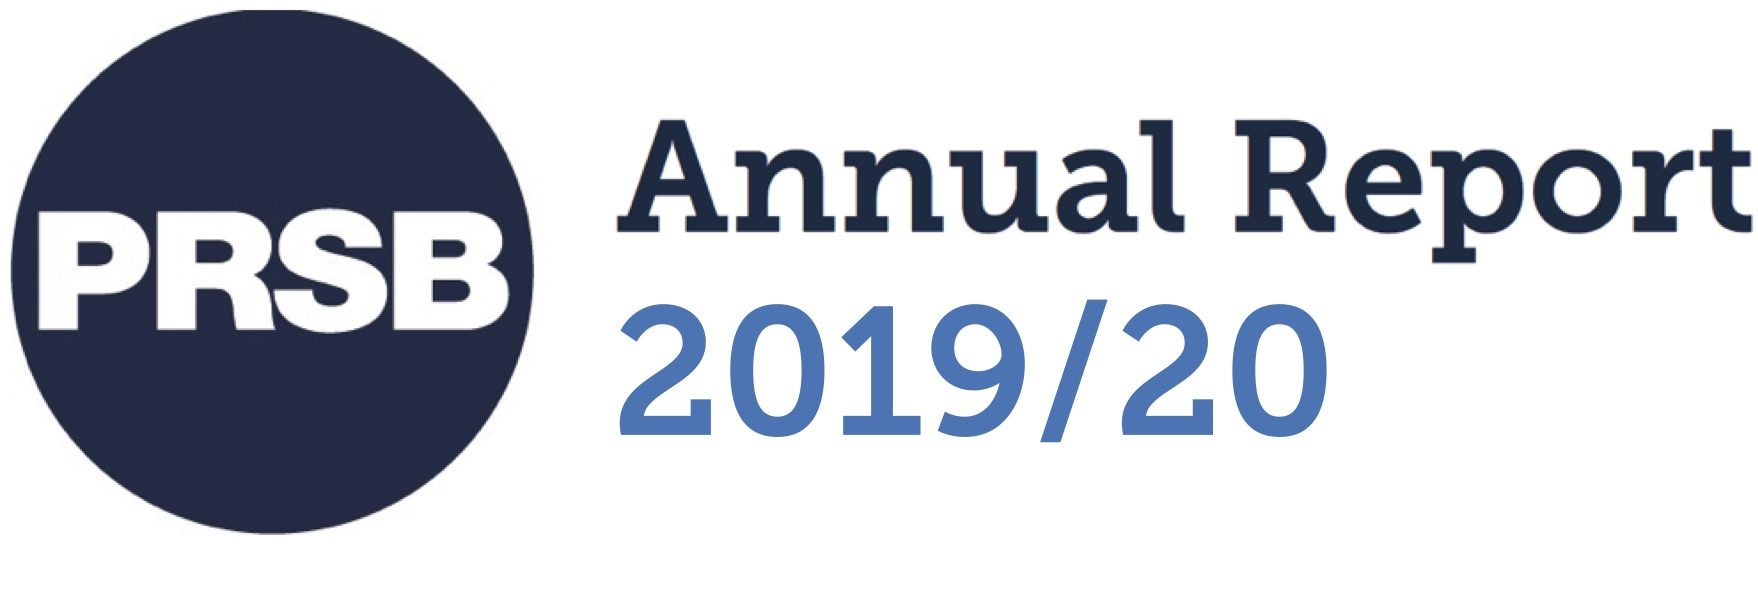 PRSB annual report 2019-20